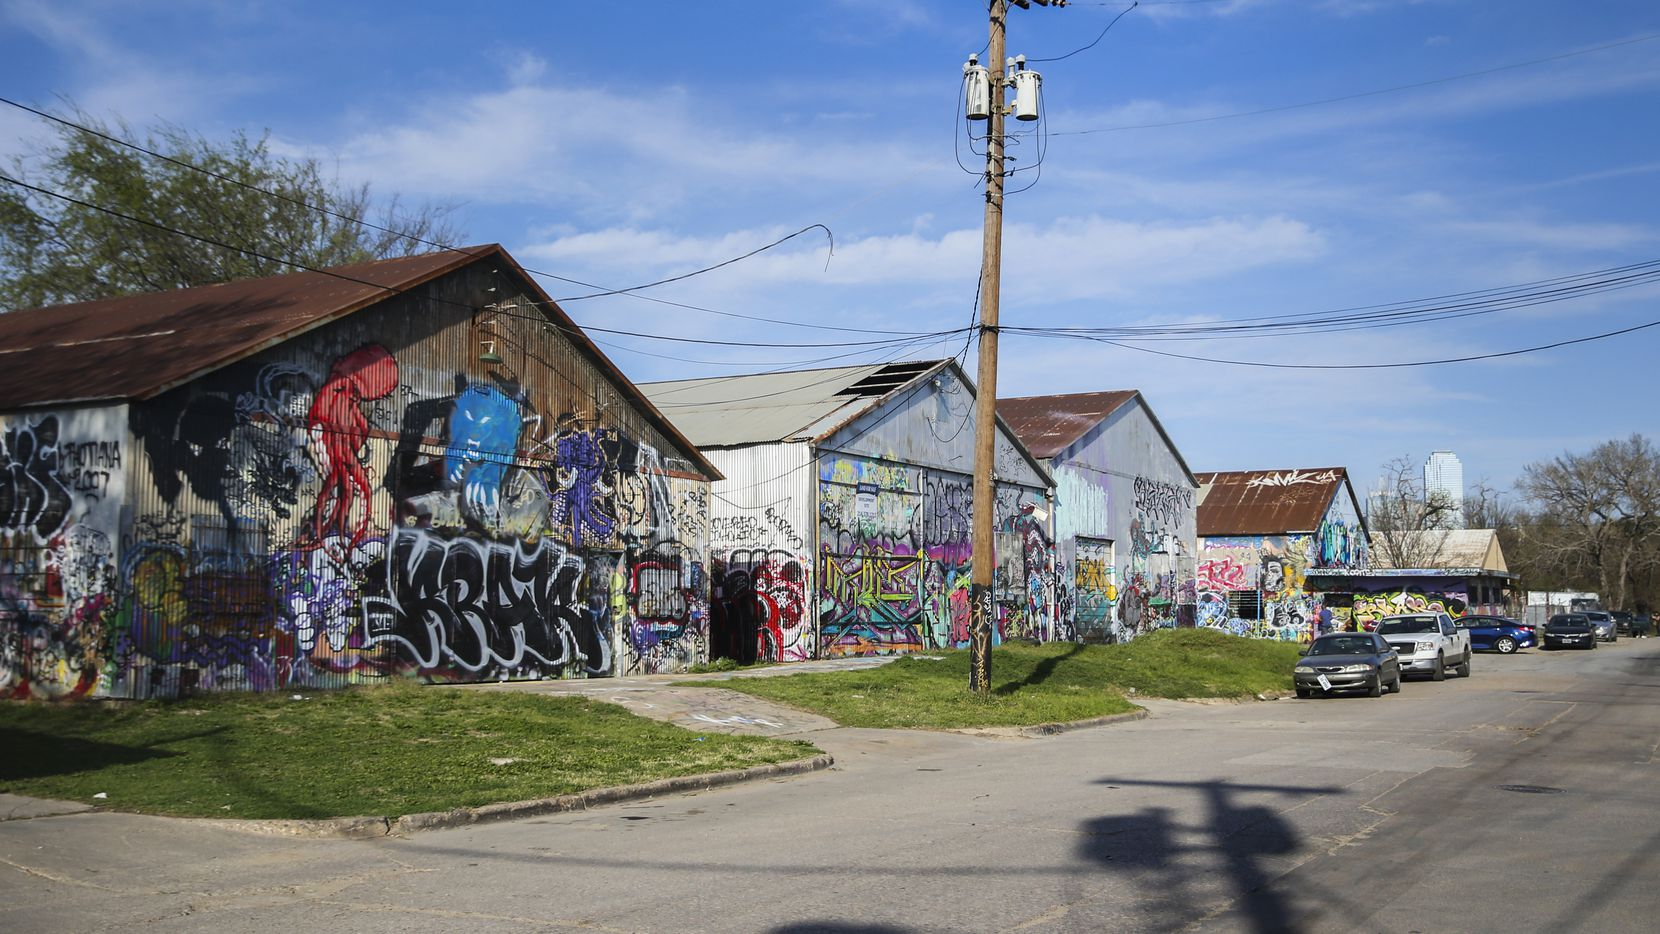 Graffiti is seen at Fabrication Yard near Sylvan Avenue in West Dallas.